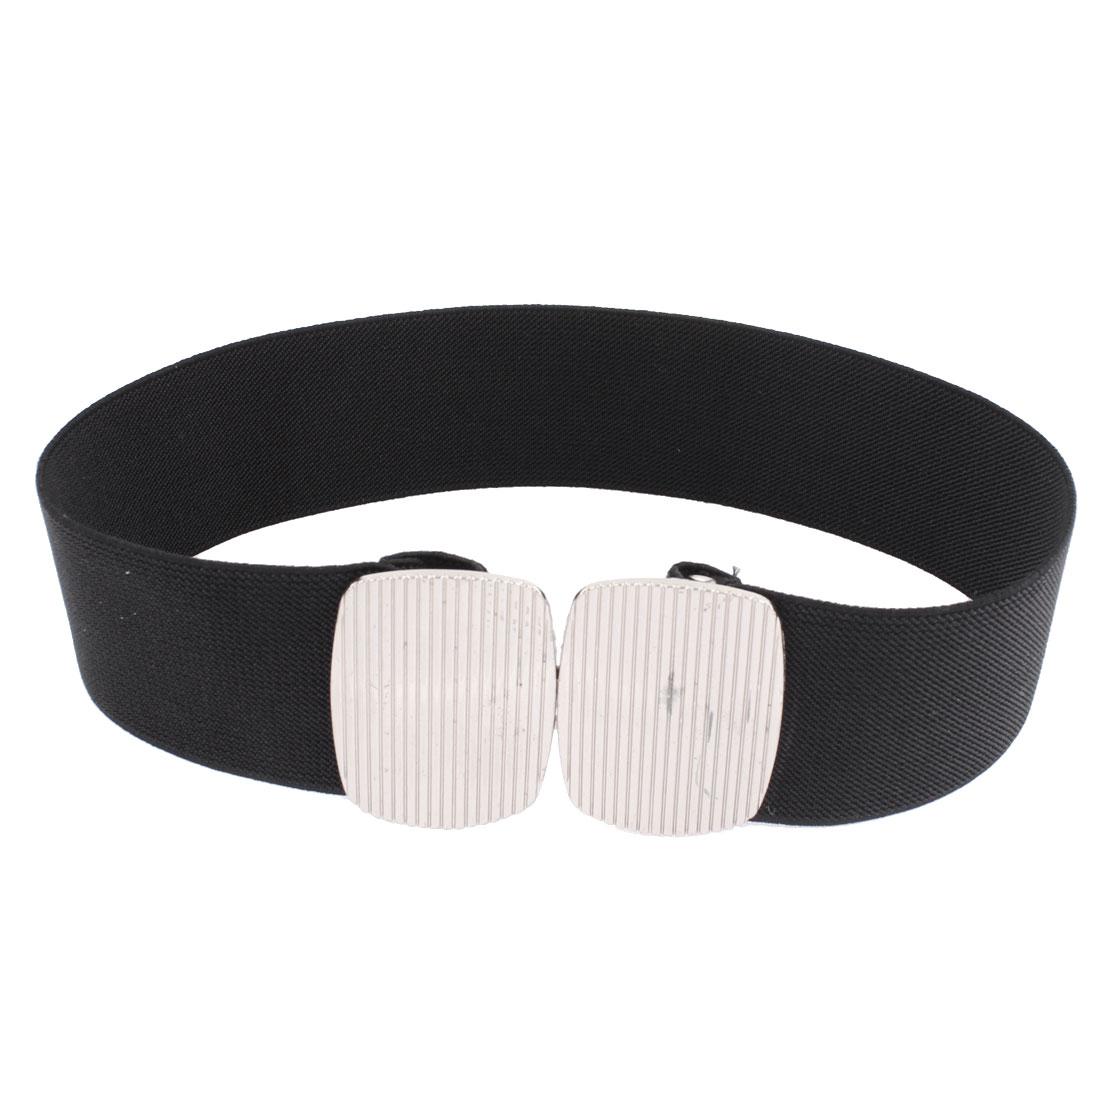 Women Metal Interlock Buckle Elastic Cinch Waist Belt Black